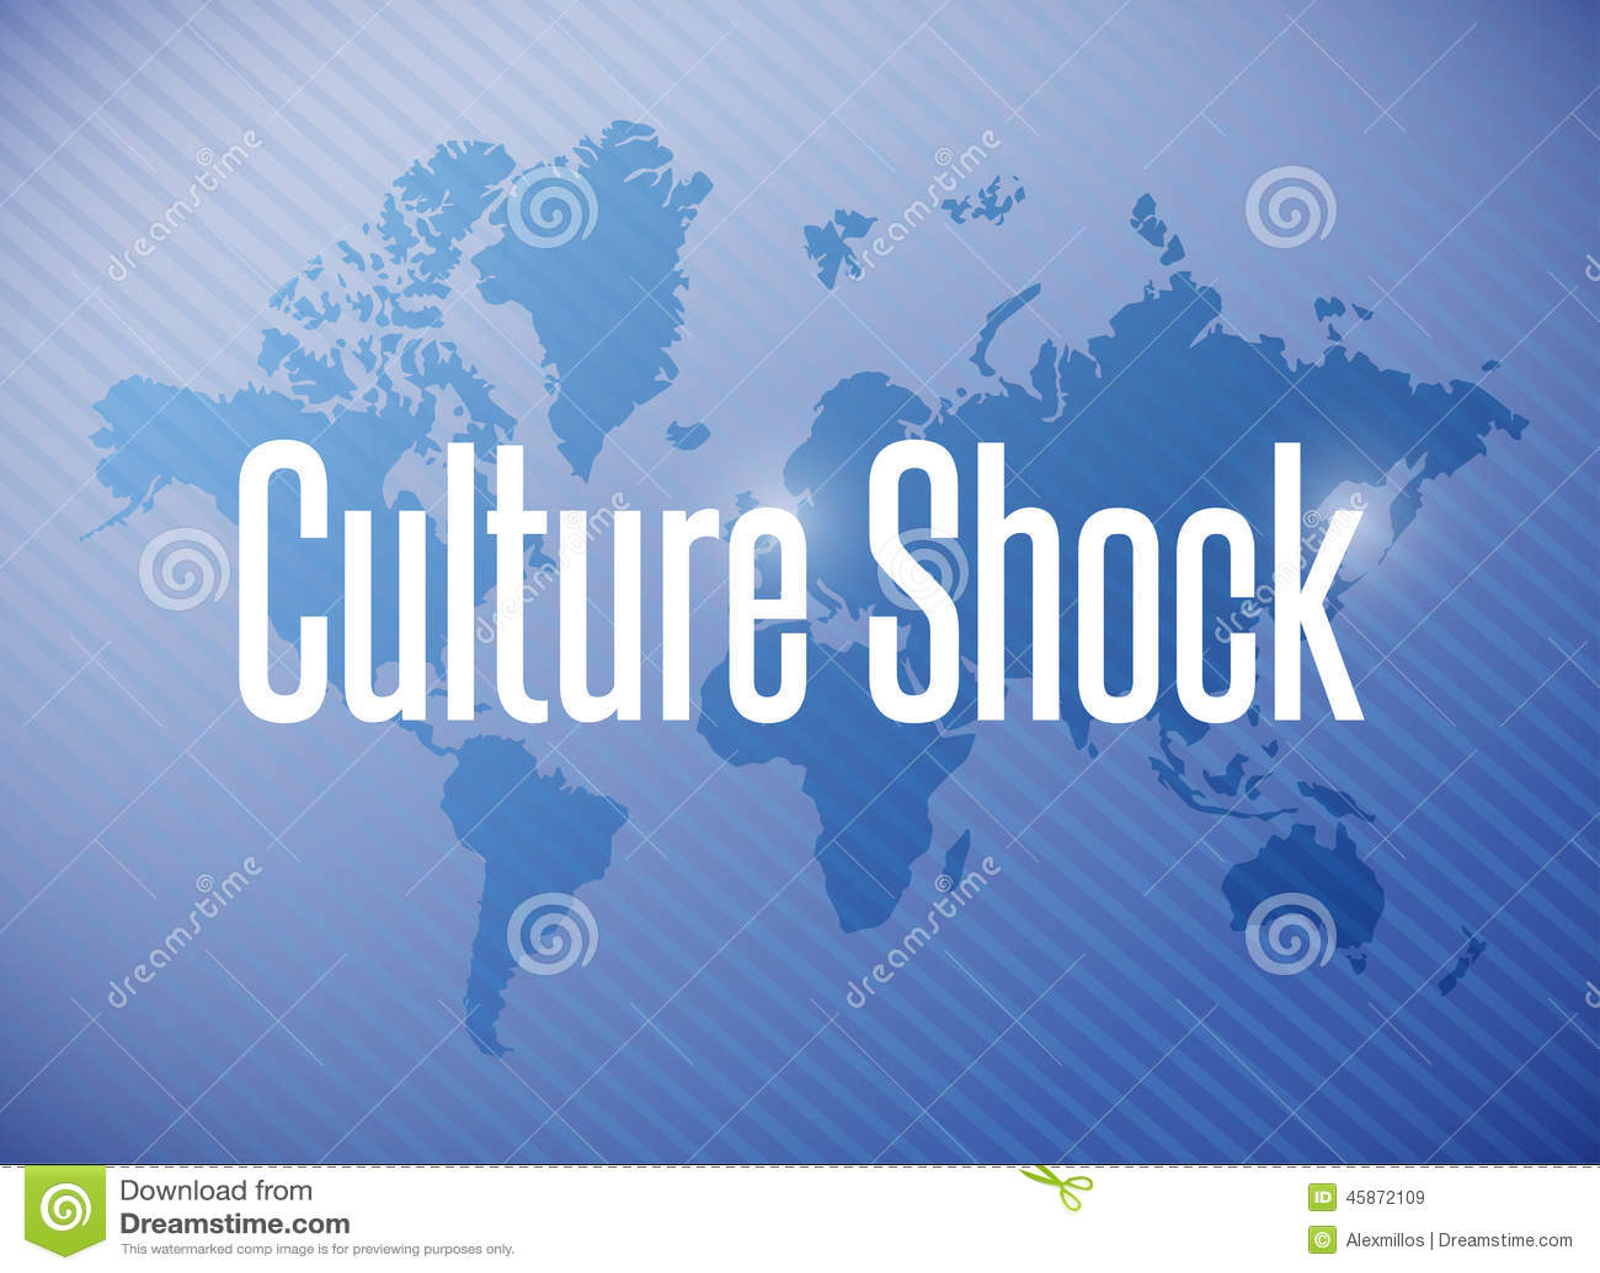 Culture shock sign illustration design stock illustration download comp gumiabroncs Choice Image